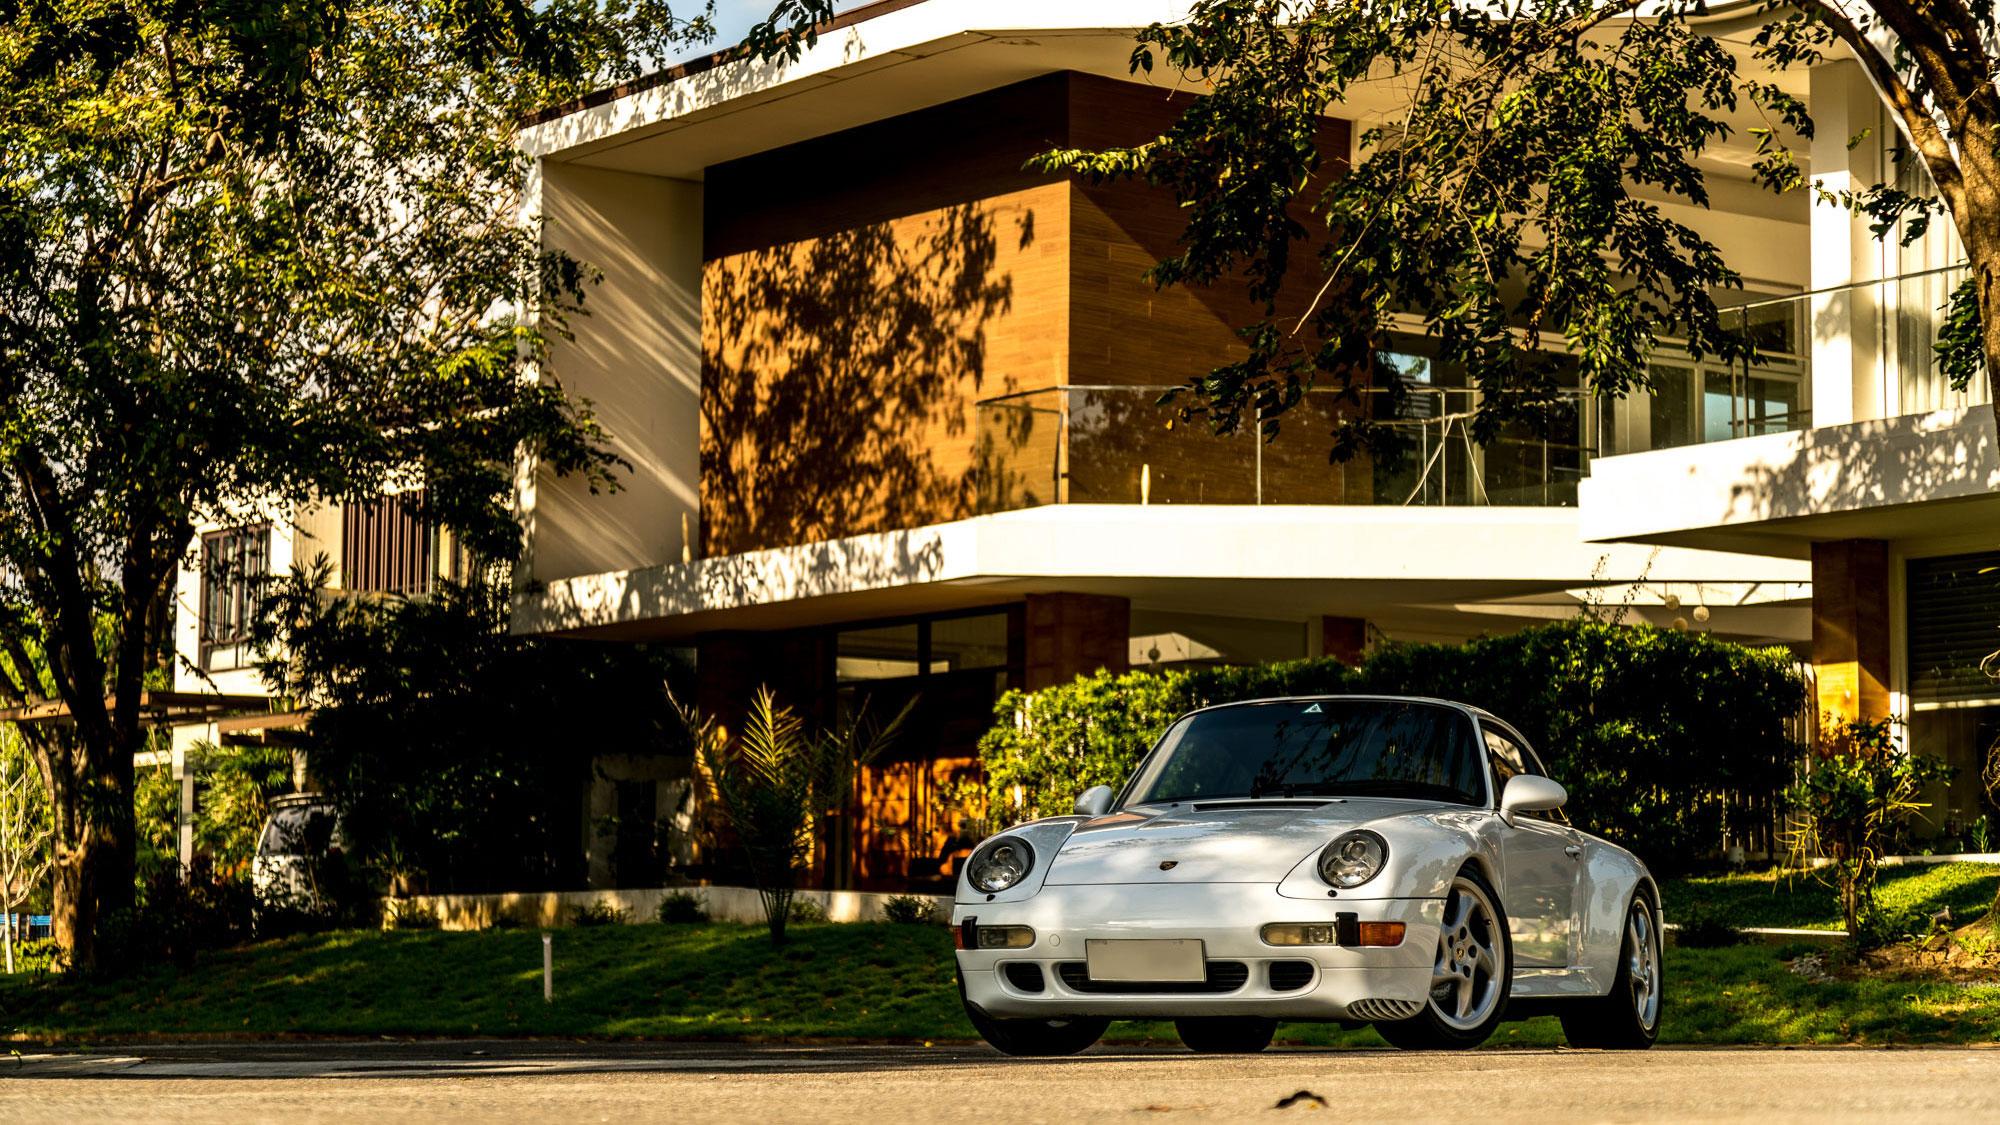 Jan 14 2017 Barn Finds Porsche 993 Carrera S 911 Stefano Marcelo PGA Cars